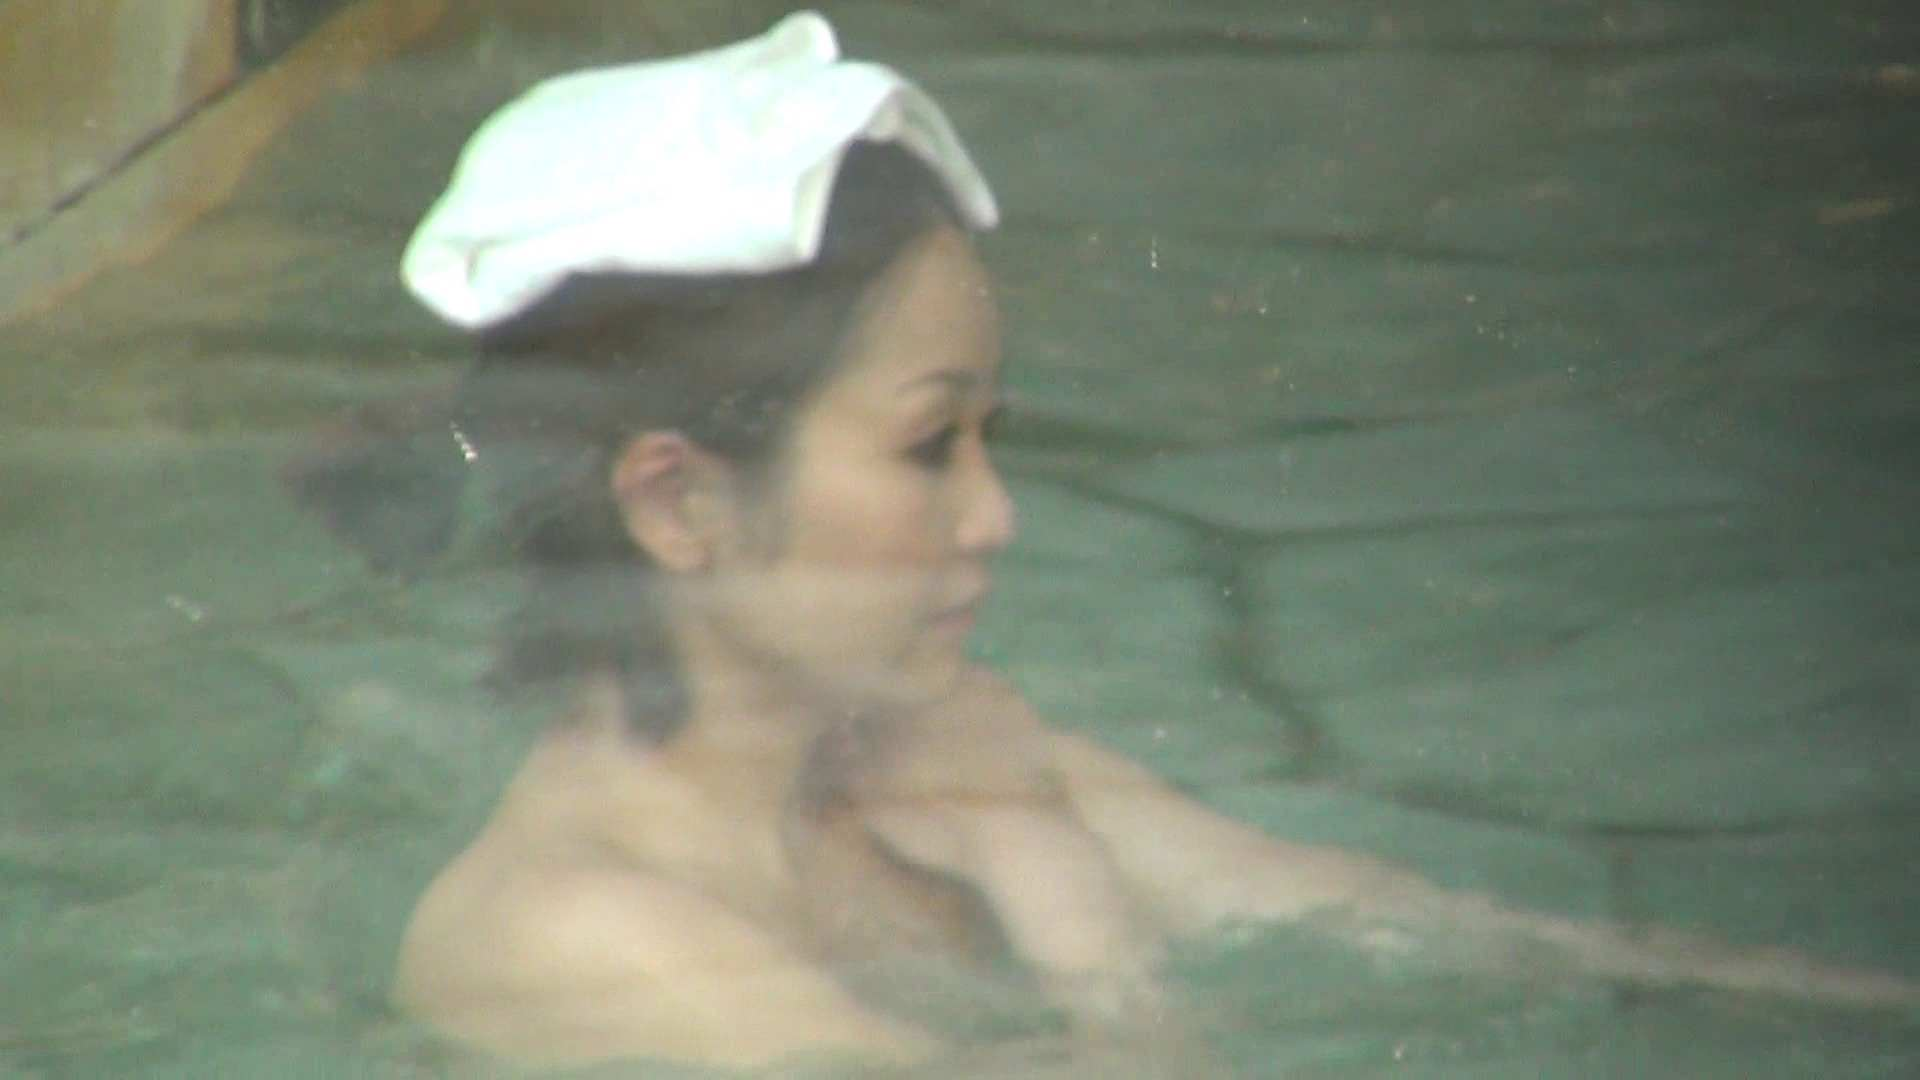 Aquaな露天風呂Vol.284 盗撮  35連発 3